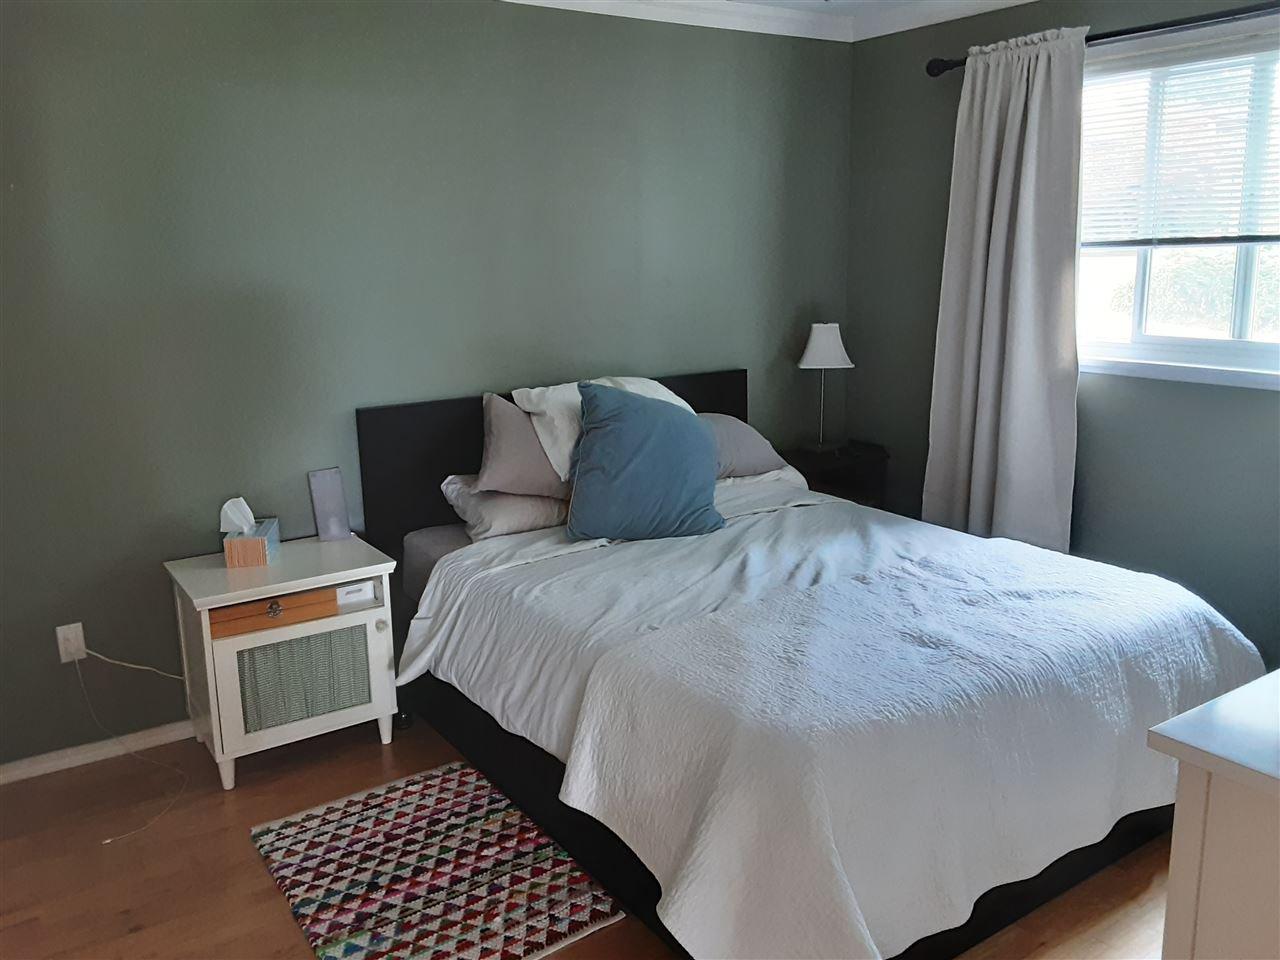 Photo 22: Photos: 15291 COLUMBIA Avenue: White Rock House for sale (South Surrey White Rock)  : MLS®# R2492863